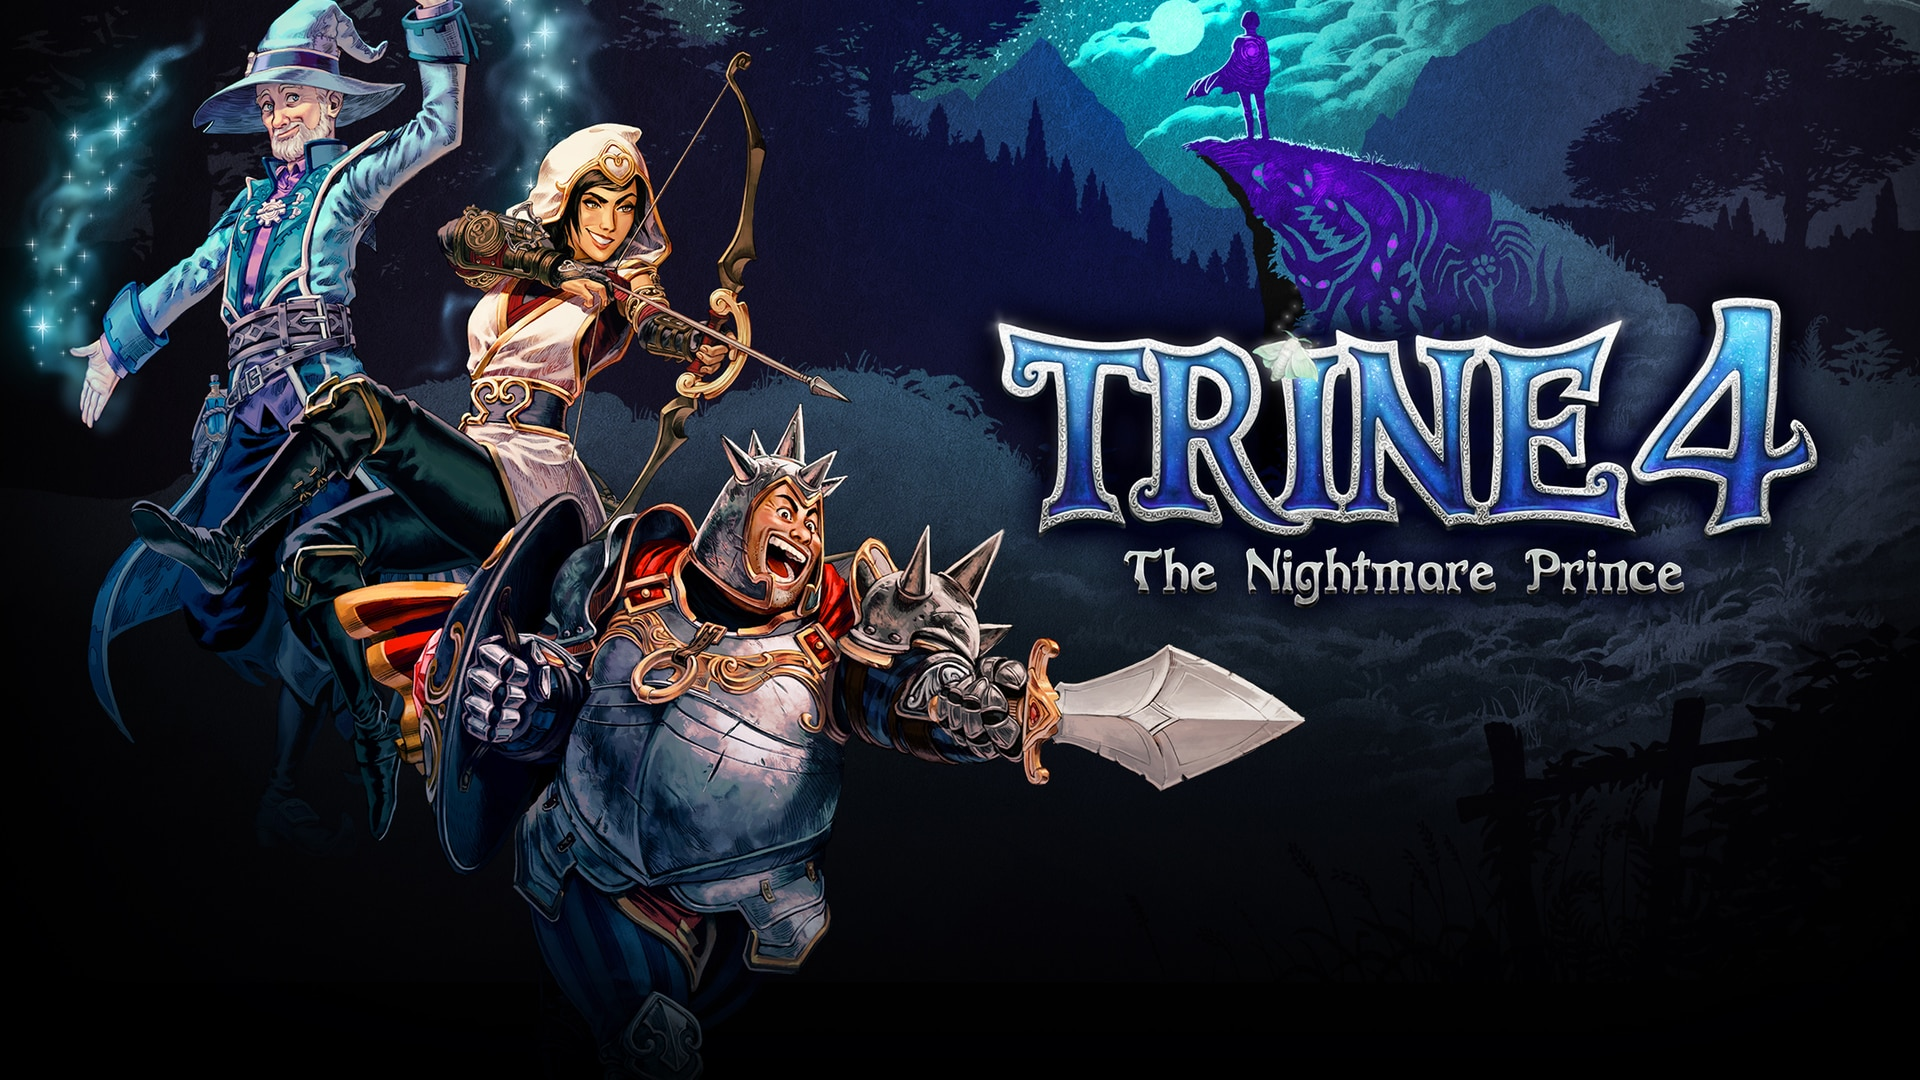 Trine 4: The Nightmare Prince (English/Chinese Ver.)